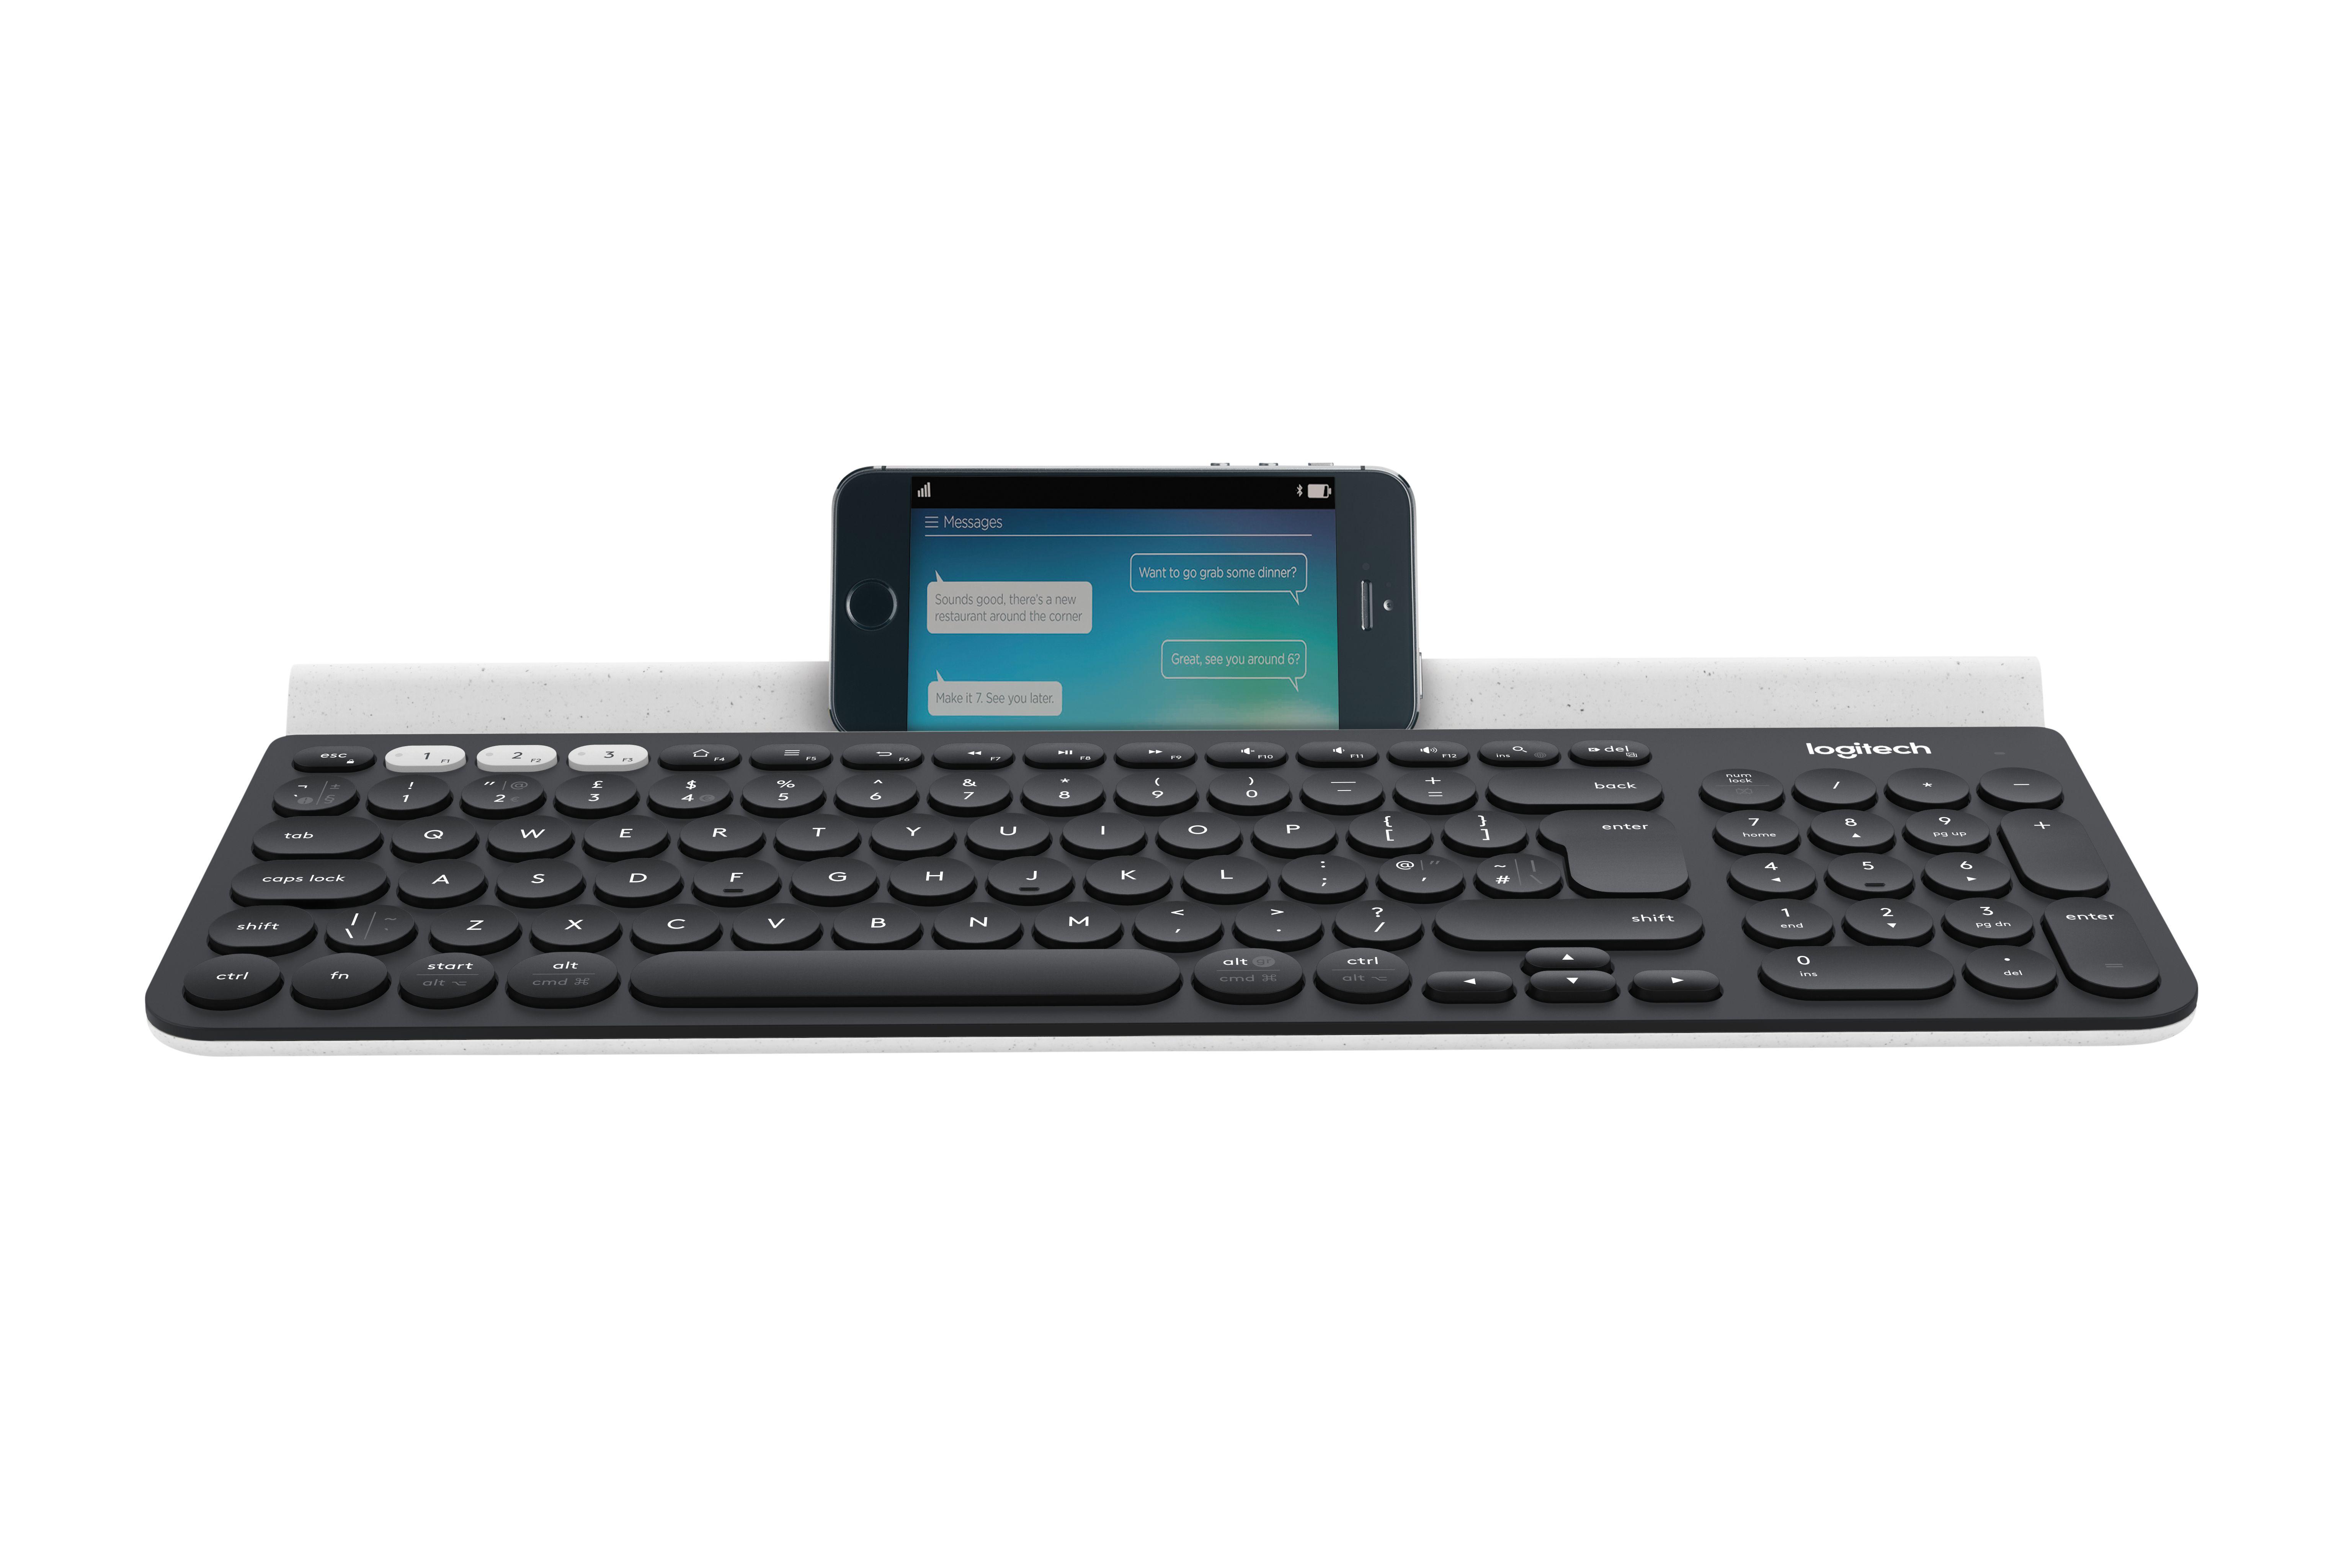 Logitech K780 Multi-Device Tastatur Trådløs Tysk